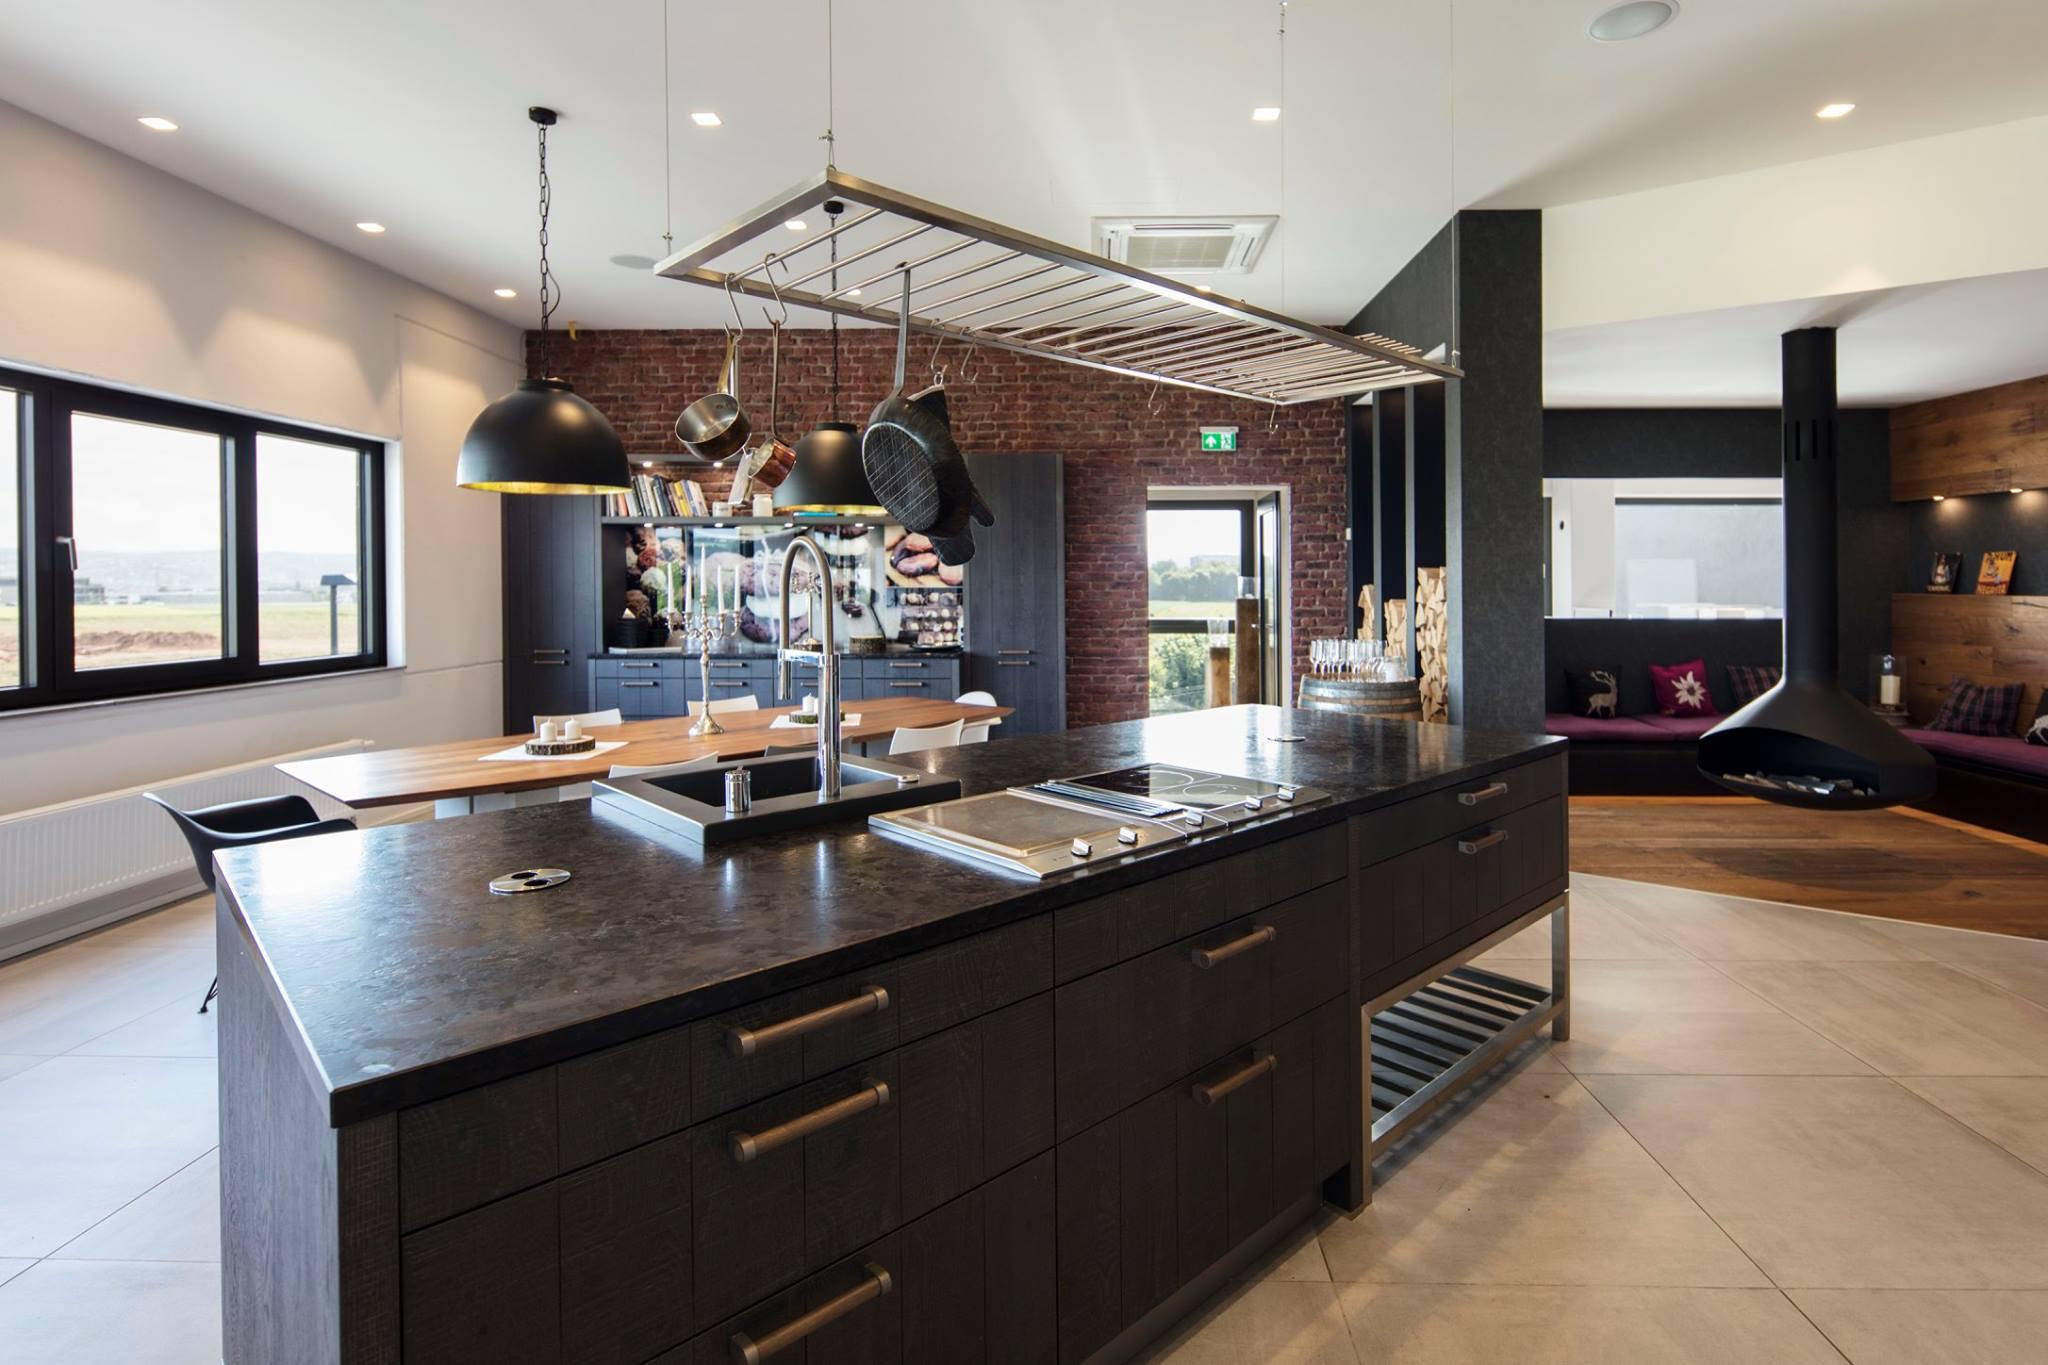 kochkurse stefan steeg die k che. Black Bedroom Furniture Sets. Home Design Ideas